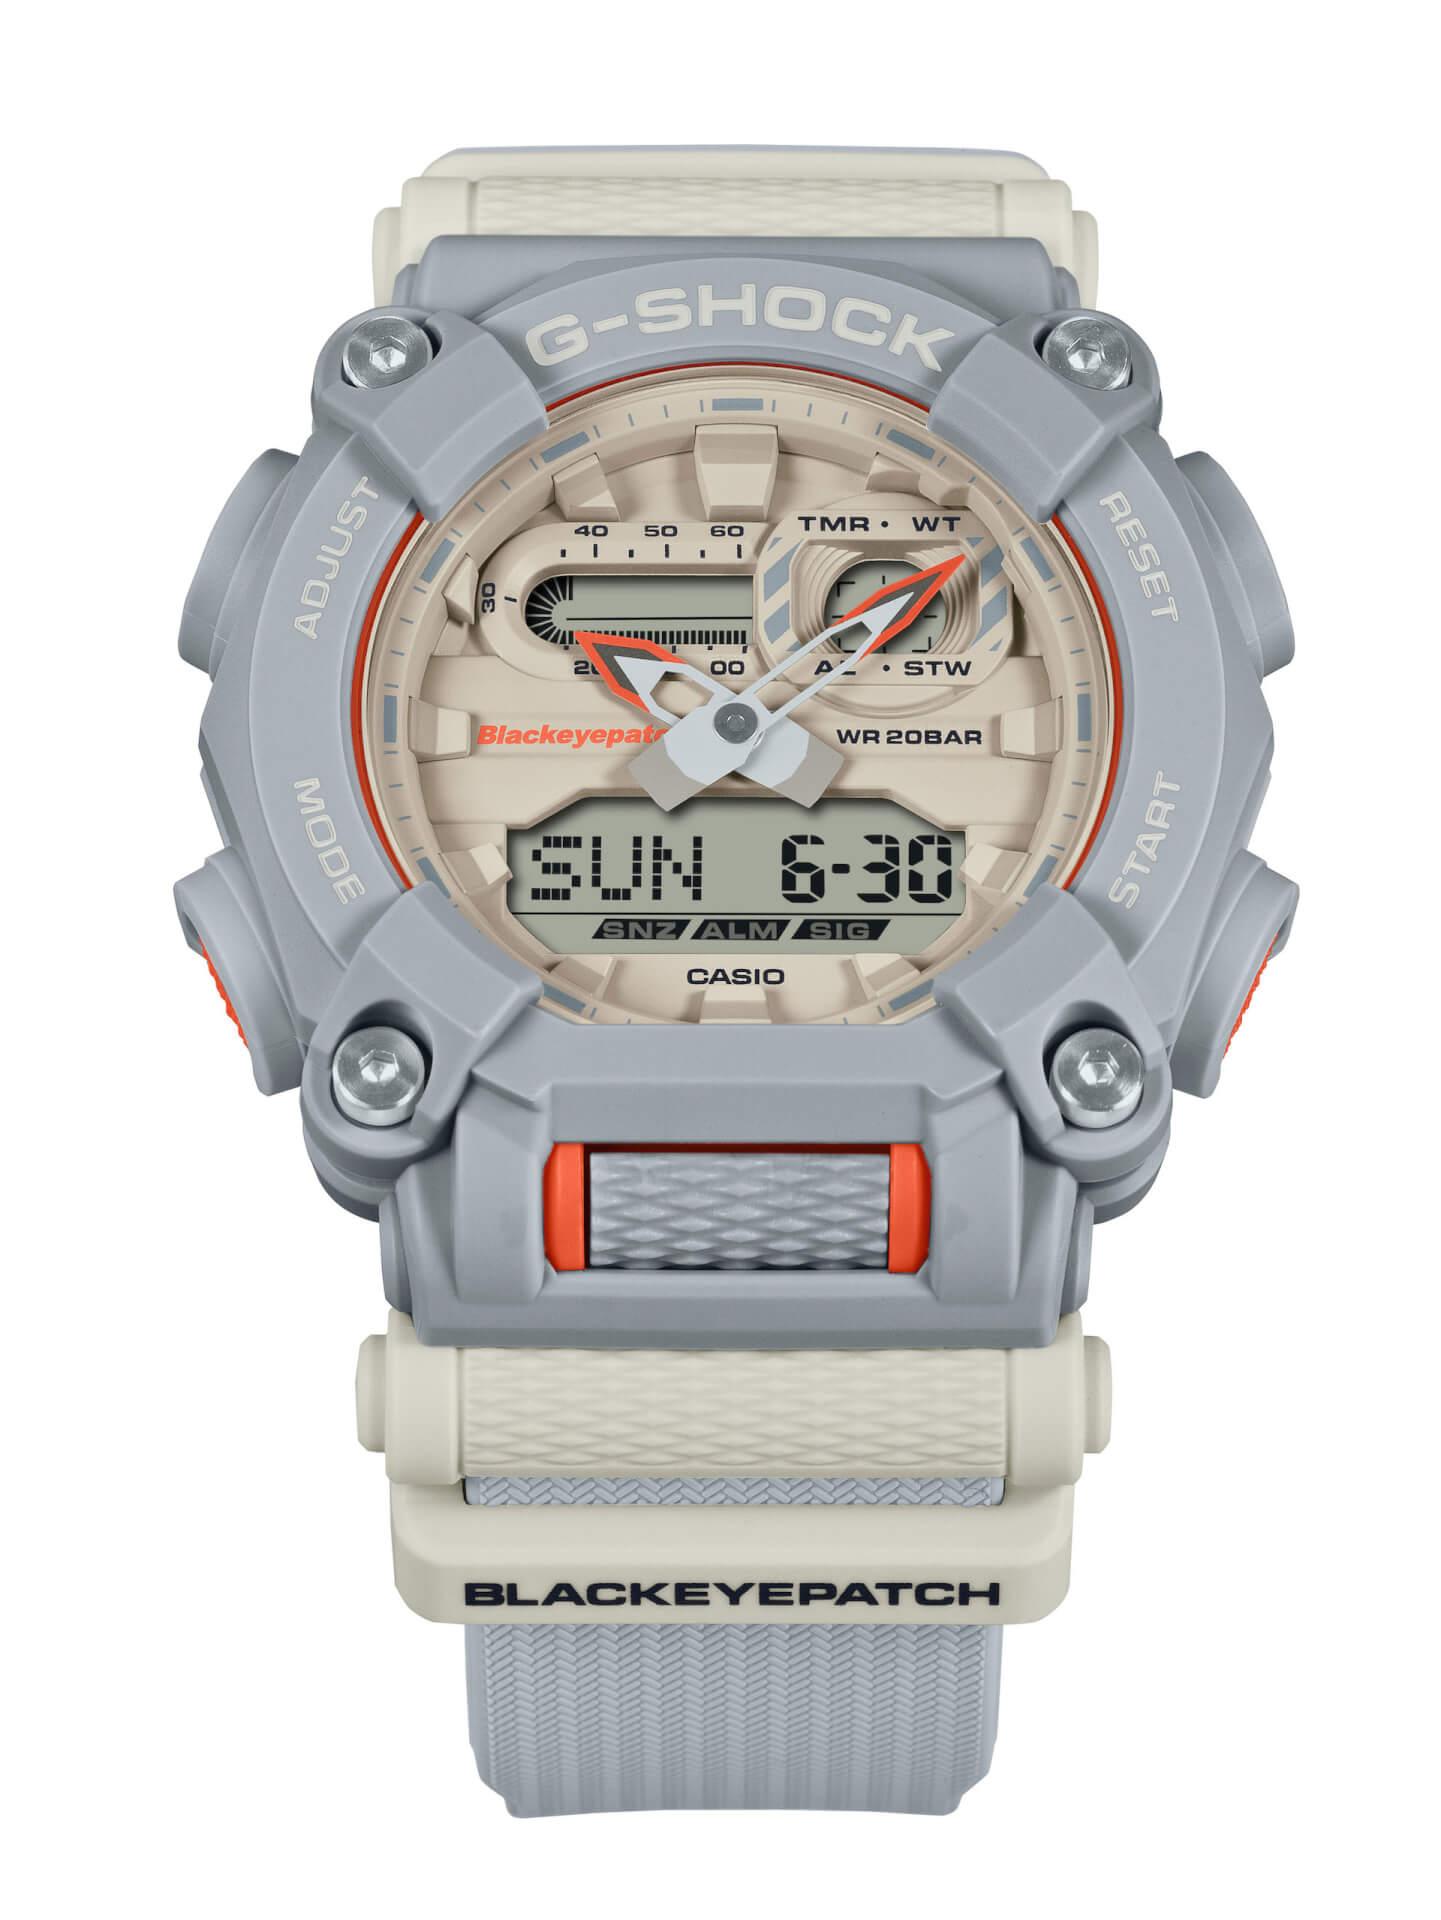 G-SHOCKとBlackEyePatchの新たなコラボモデル「GA-900BEP-8AJR」が発売決定!バンド交換可能なスタイリッシュなモデル tech210830_gshock_blackeyepatch_6